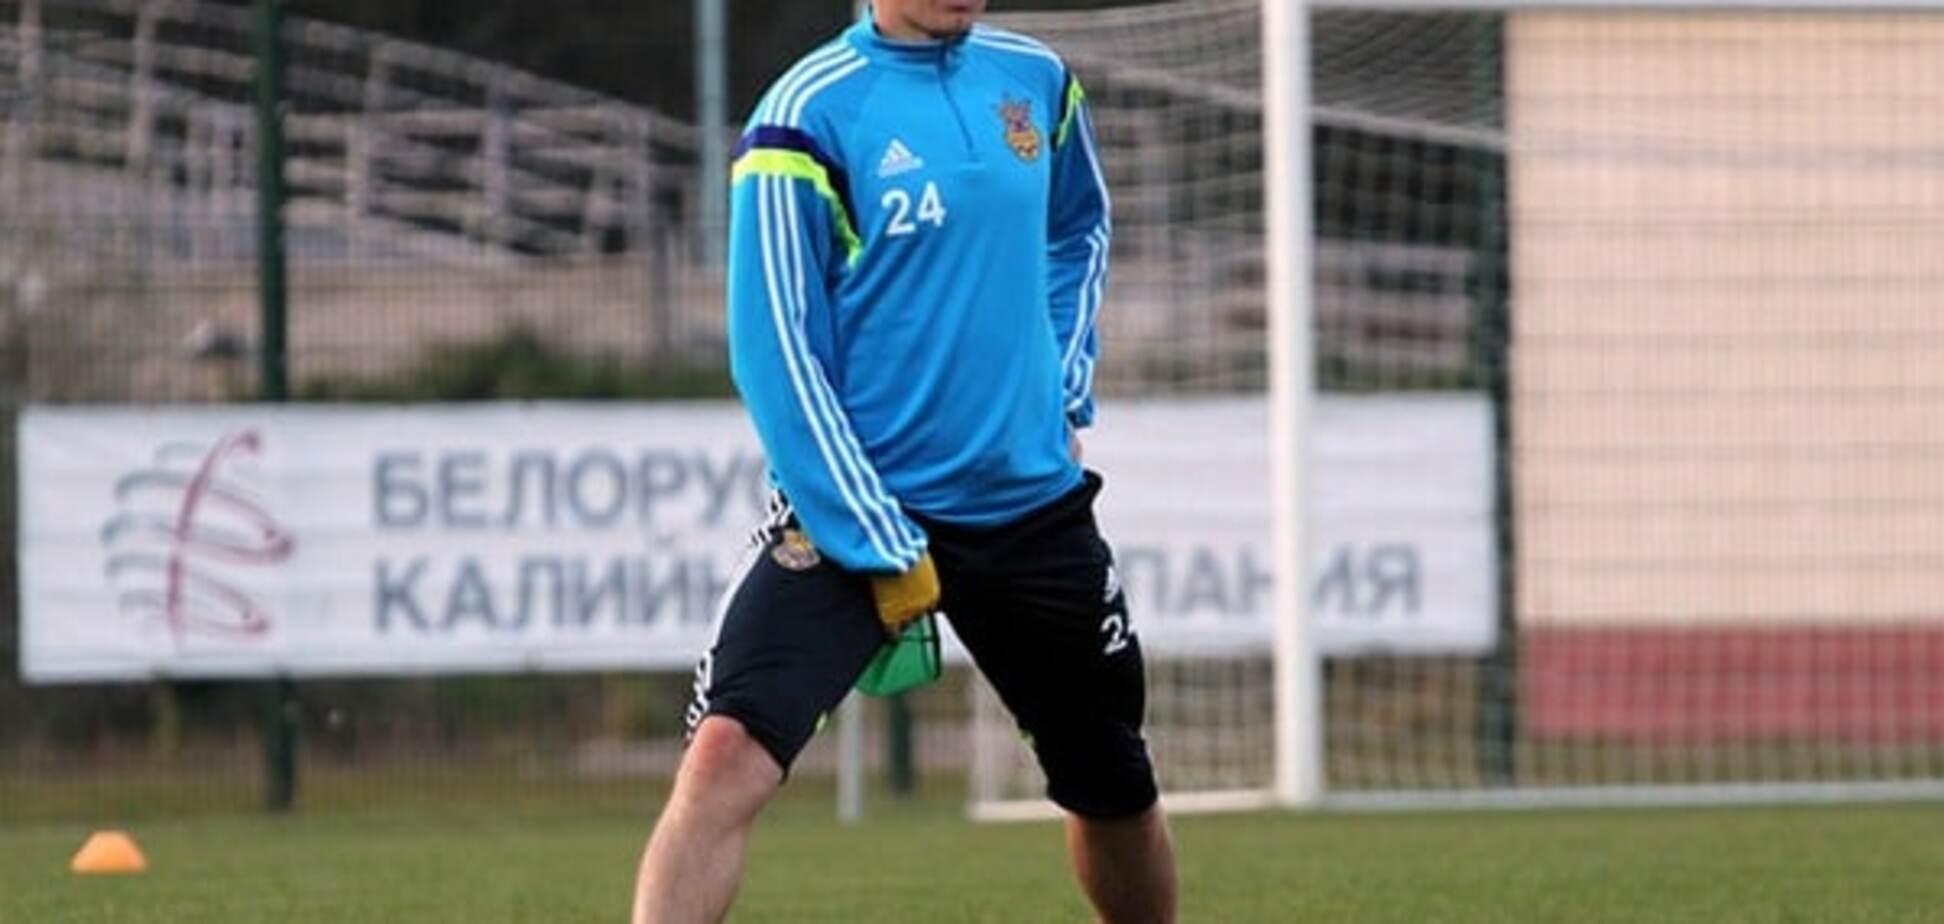 Руслан Ротань сборная Украины